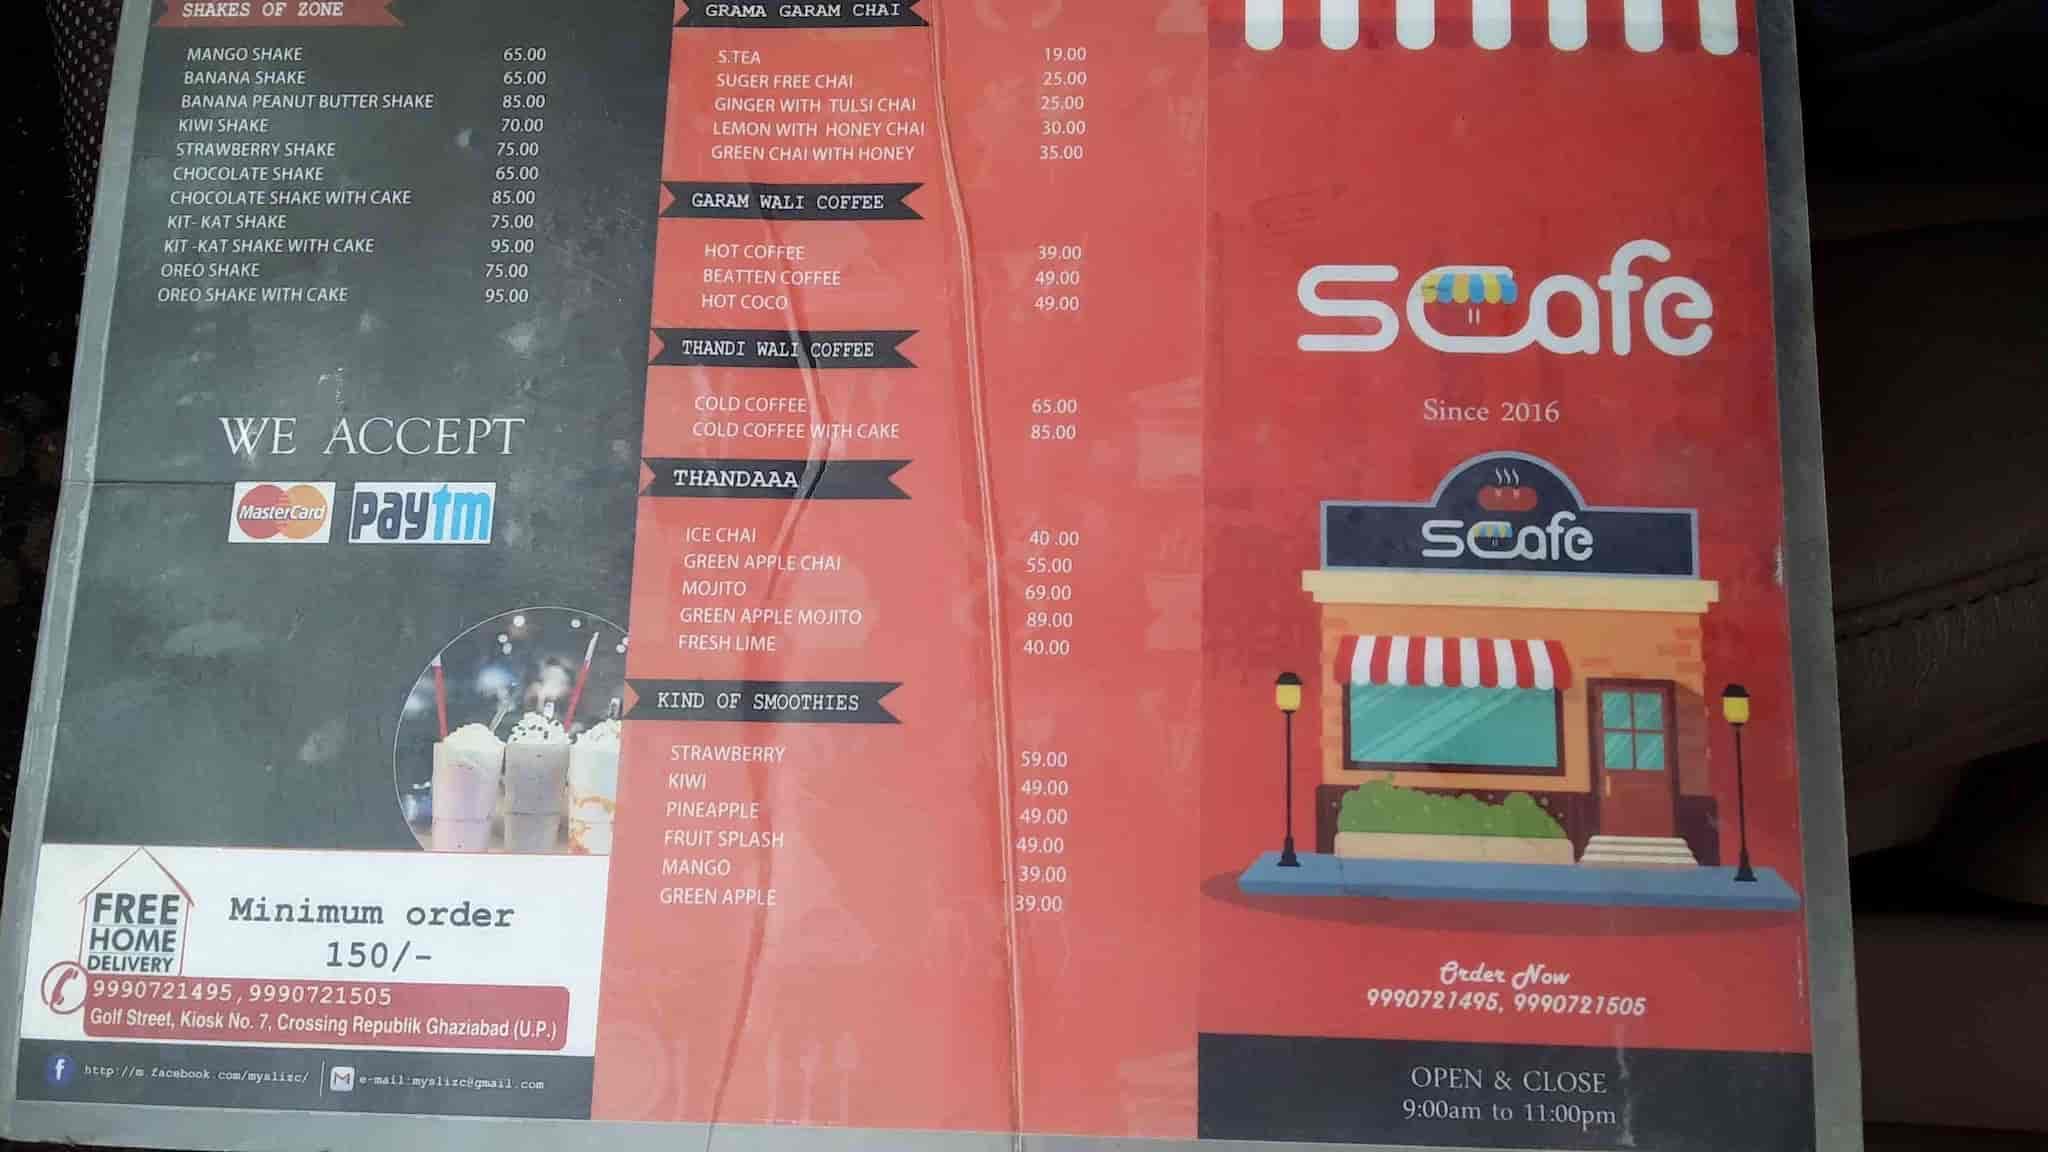 S cafe, Crossing Republik, Delhi - Fast Food - Justdial